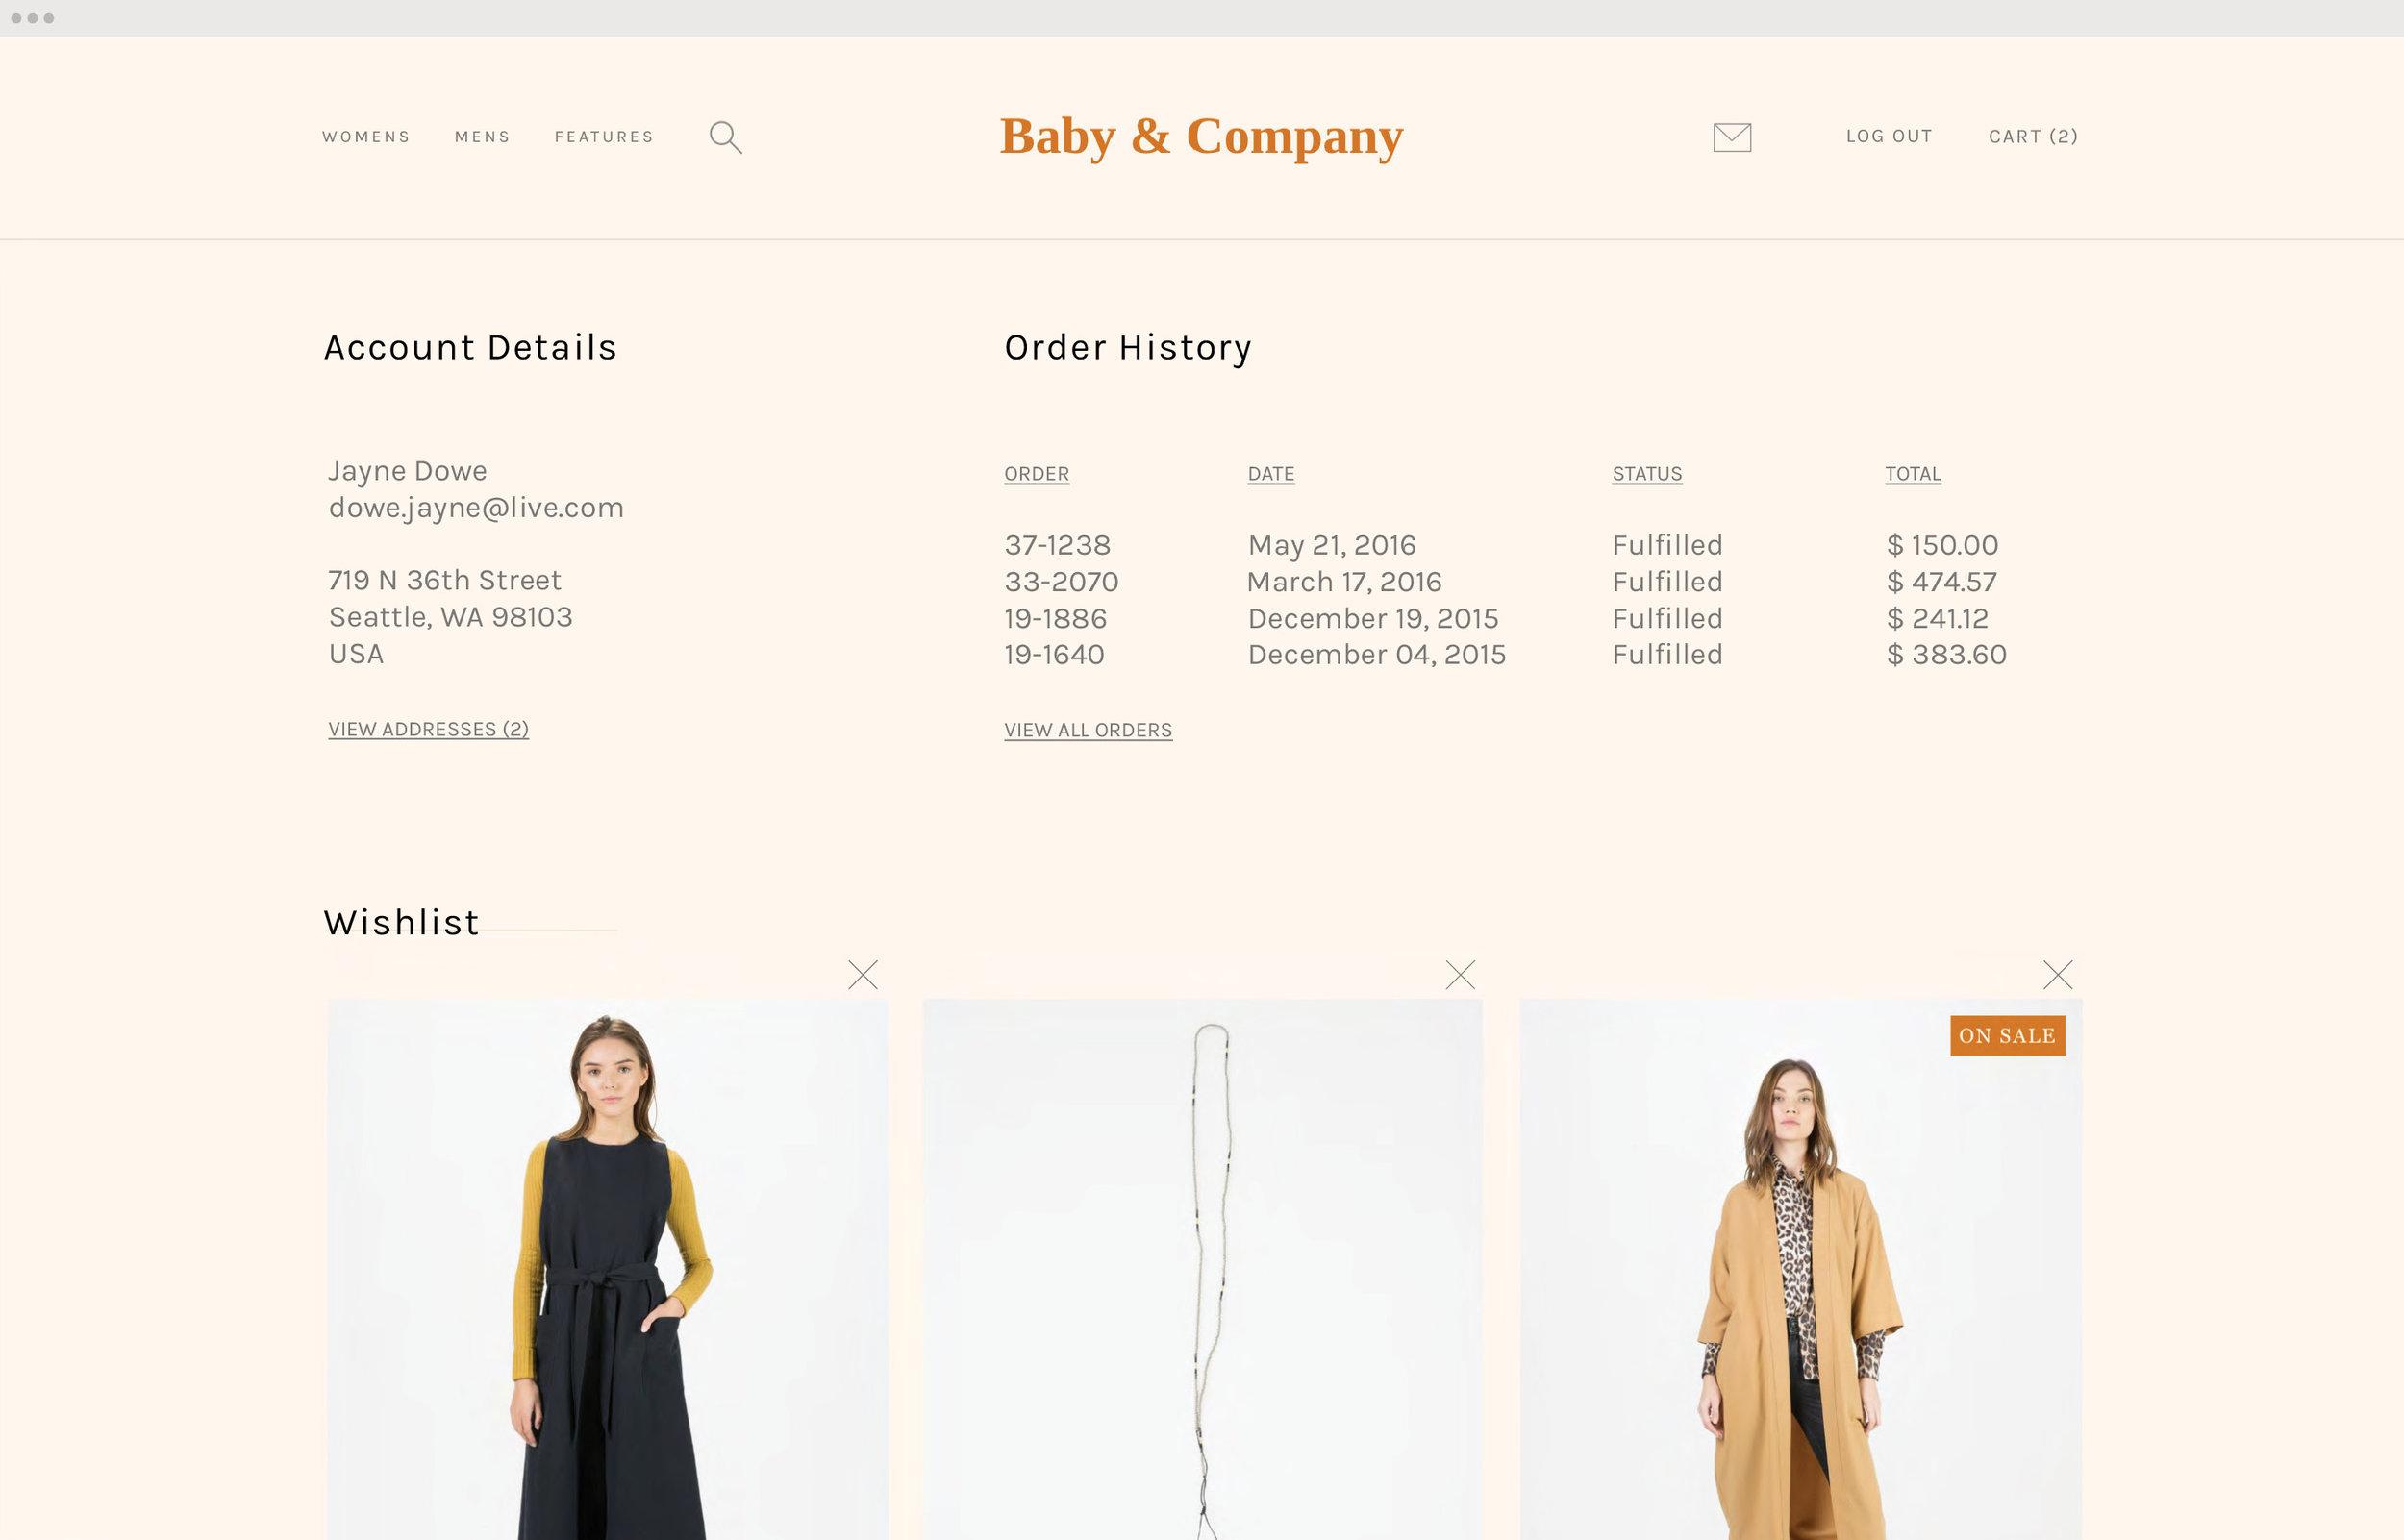 Web Tiles_2019_Web Design - B&C site customization11.jpg